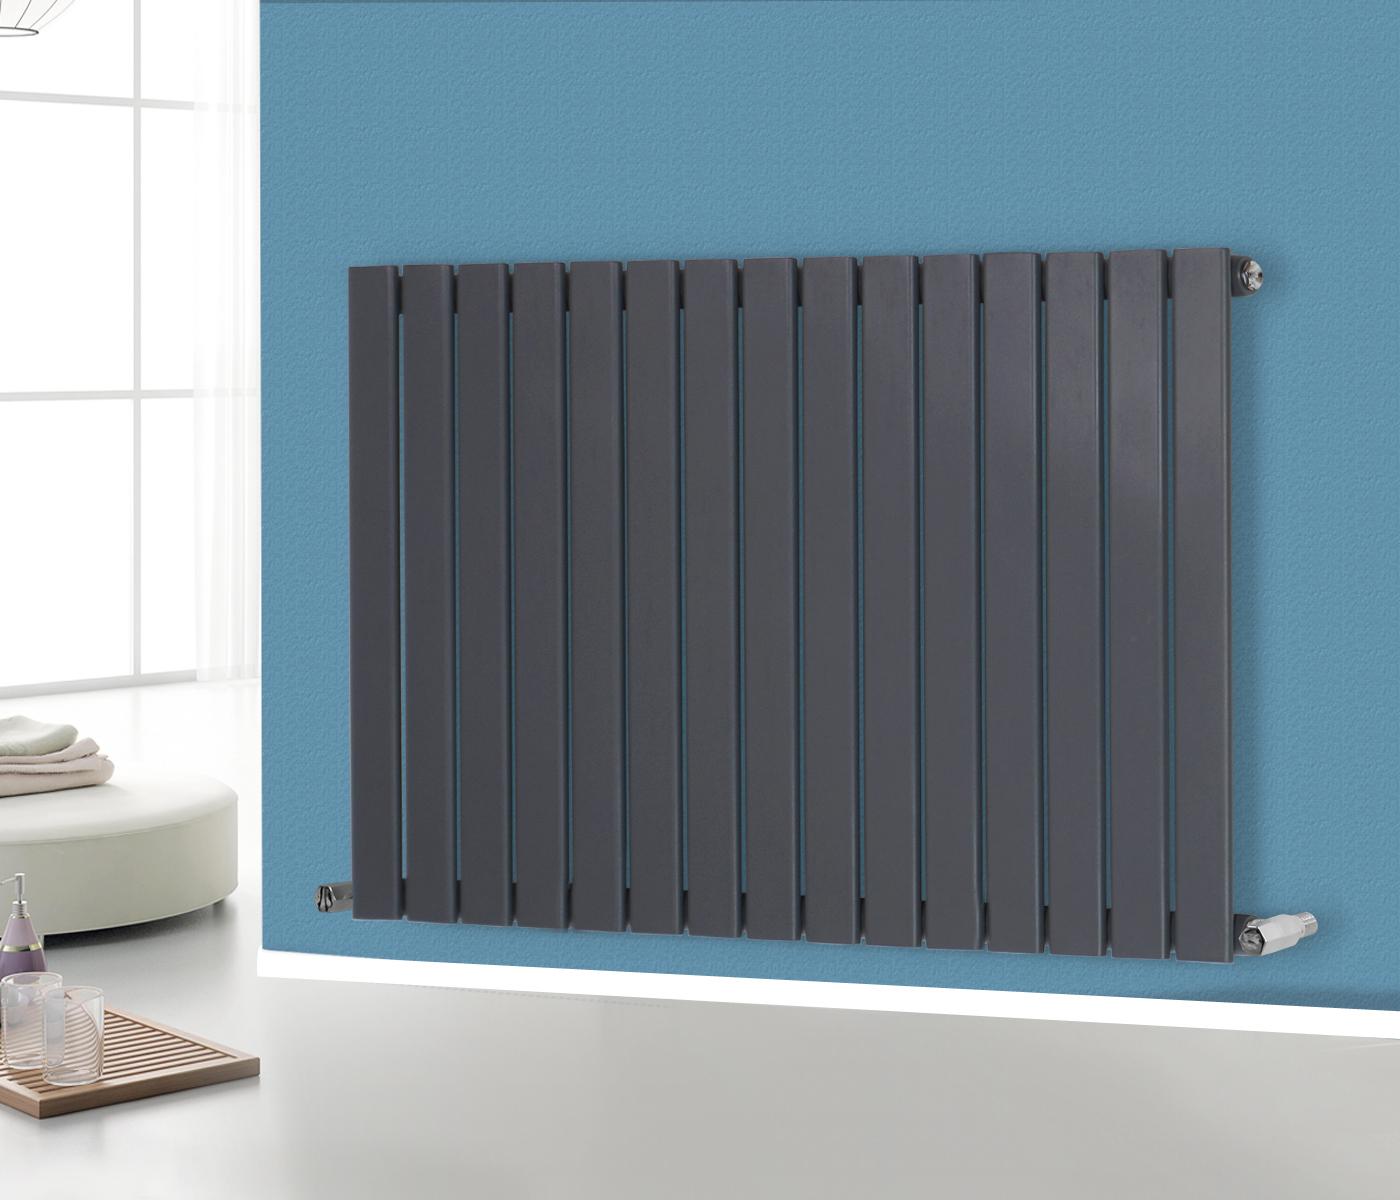 chair covers ebay uk short high horizontal flat panel single column designer modern radiators central heating |